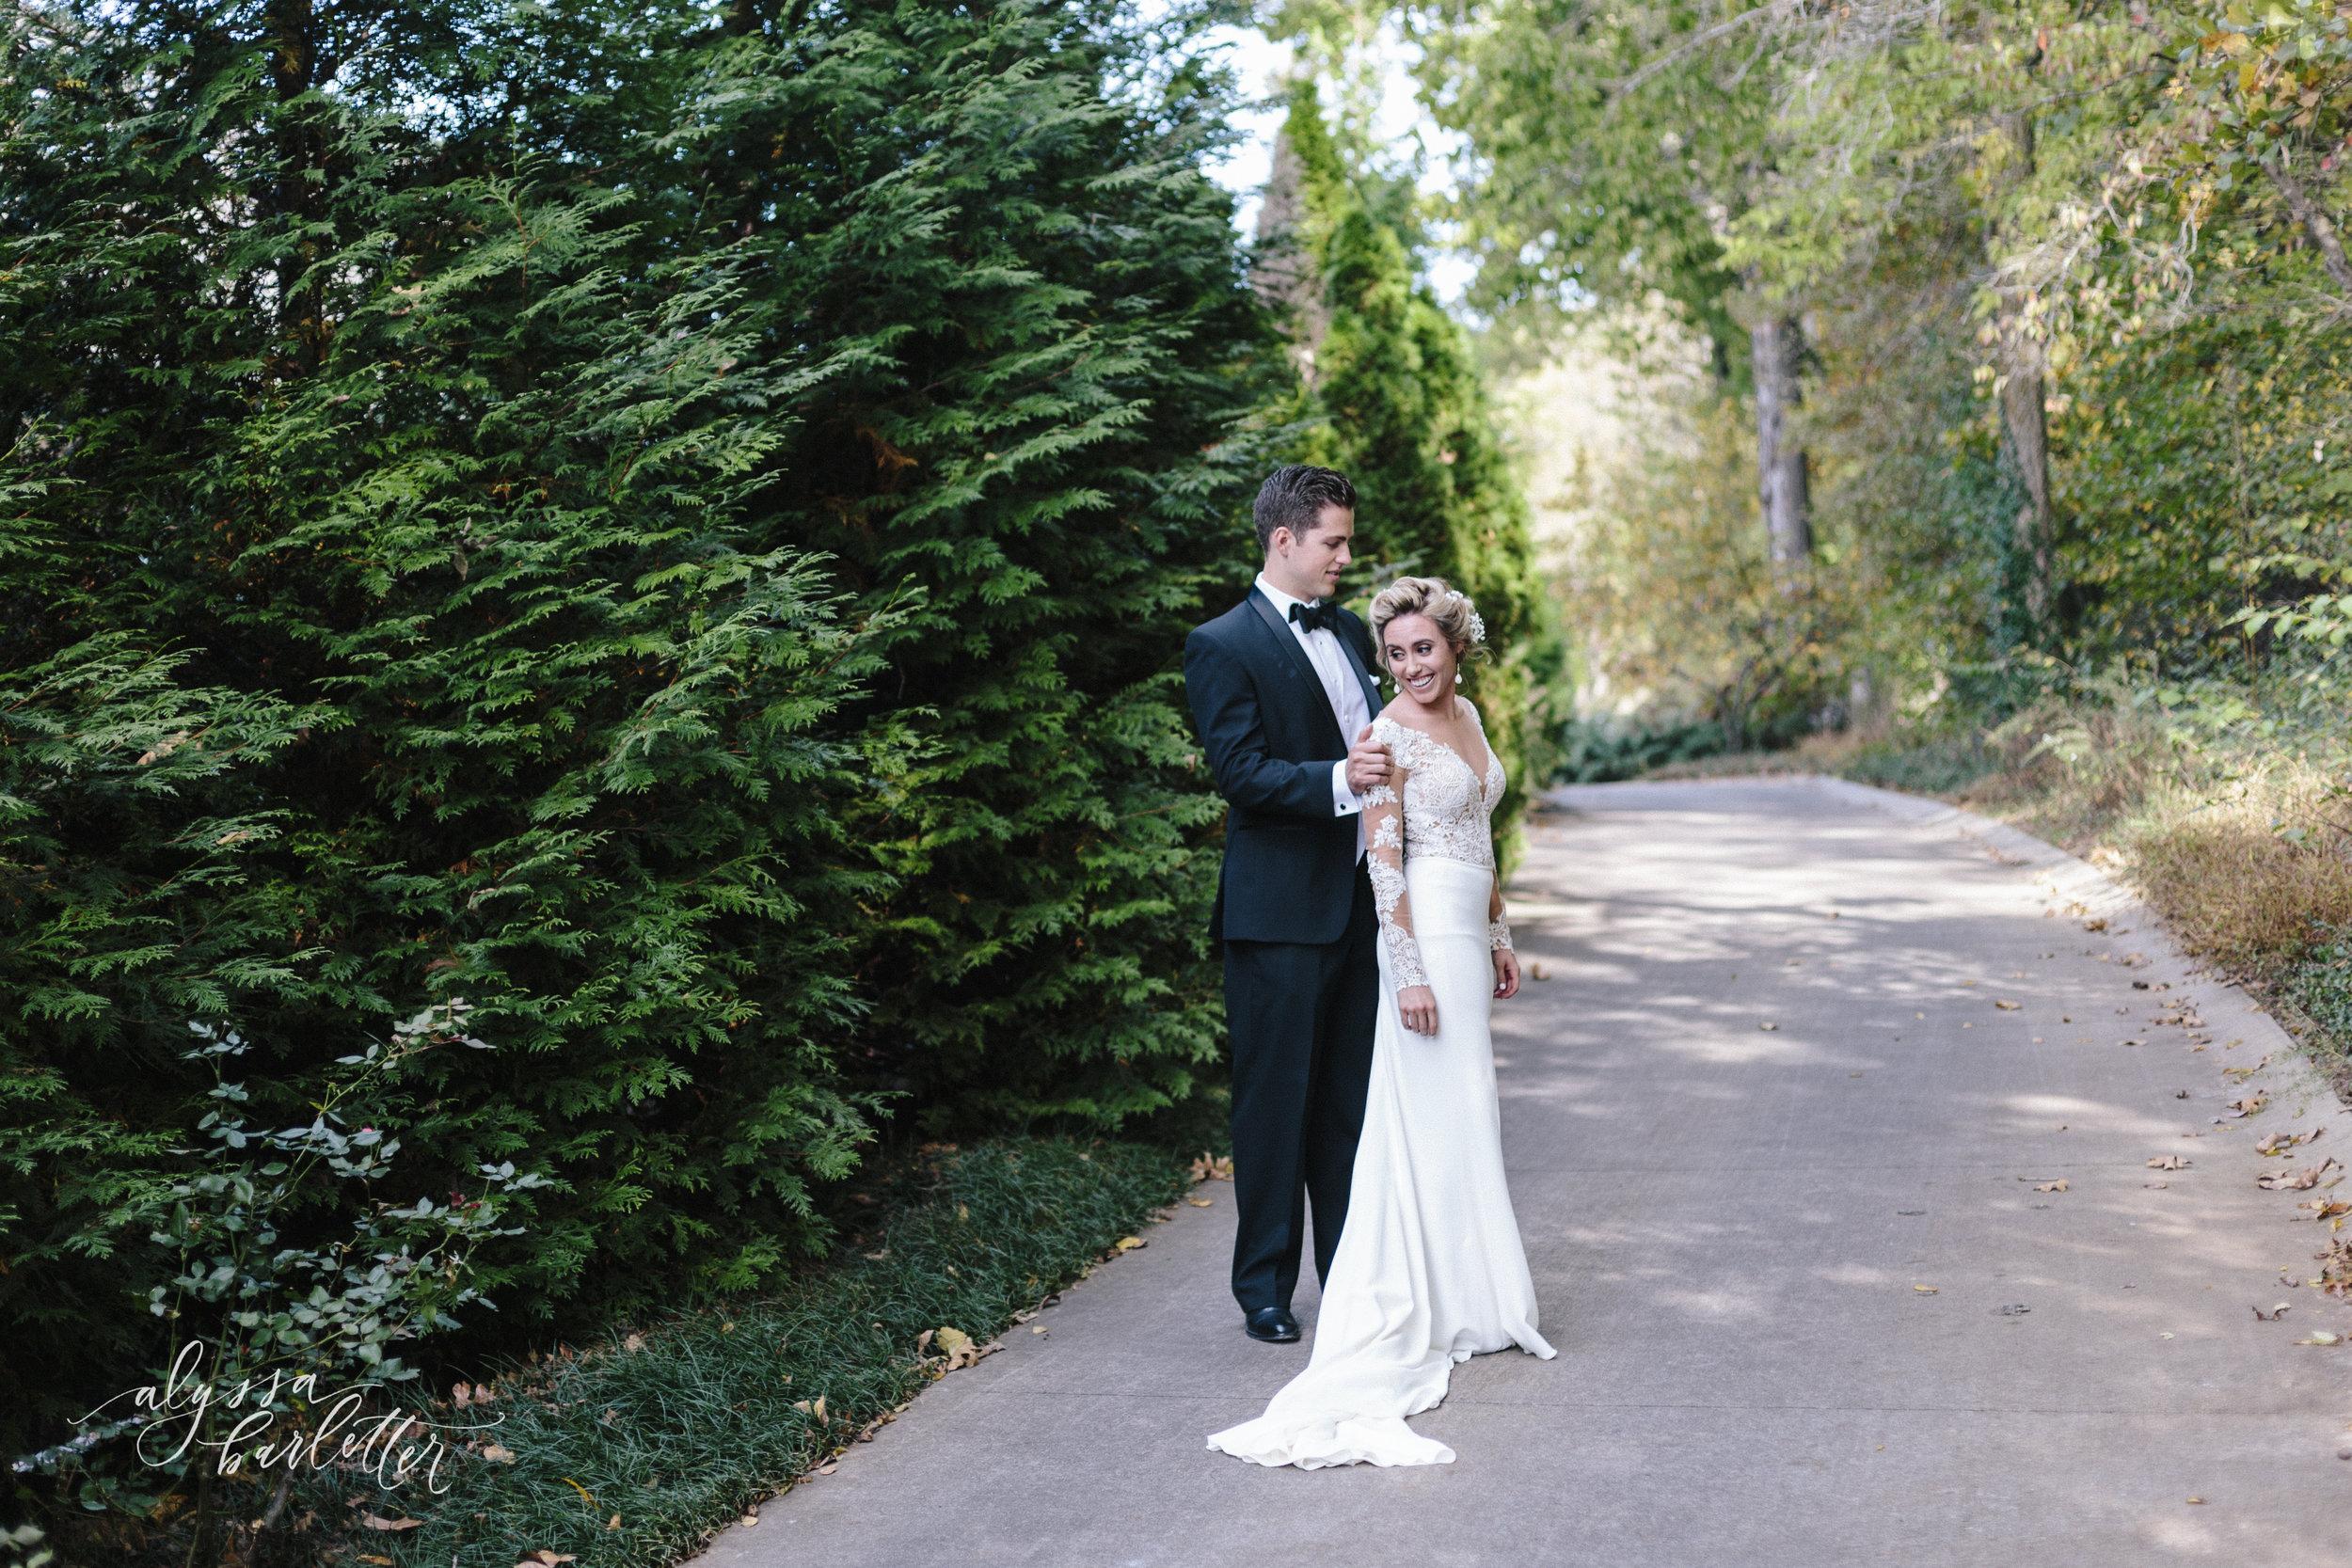 alyssa barletter photography fayetteville arkansas wedding photos micah and colin-1-22.jpg